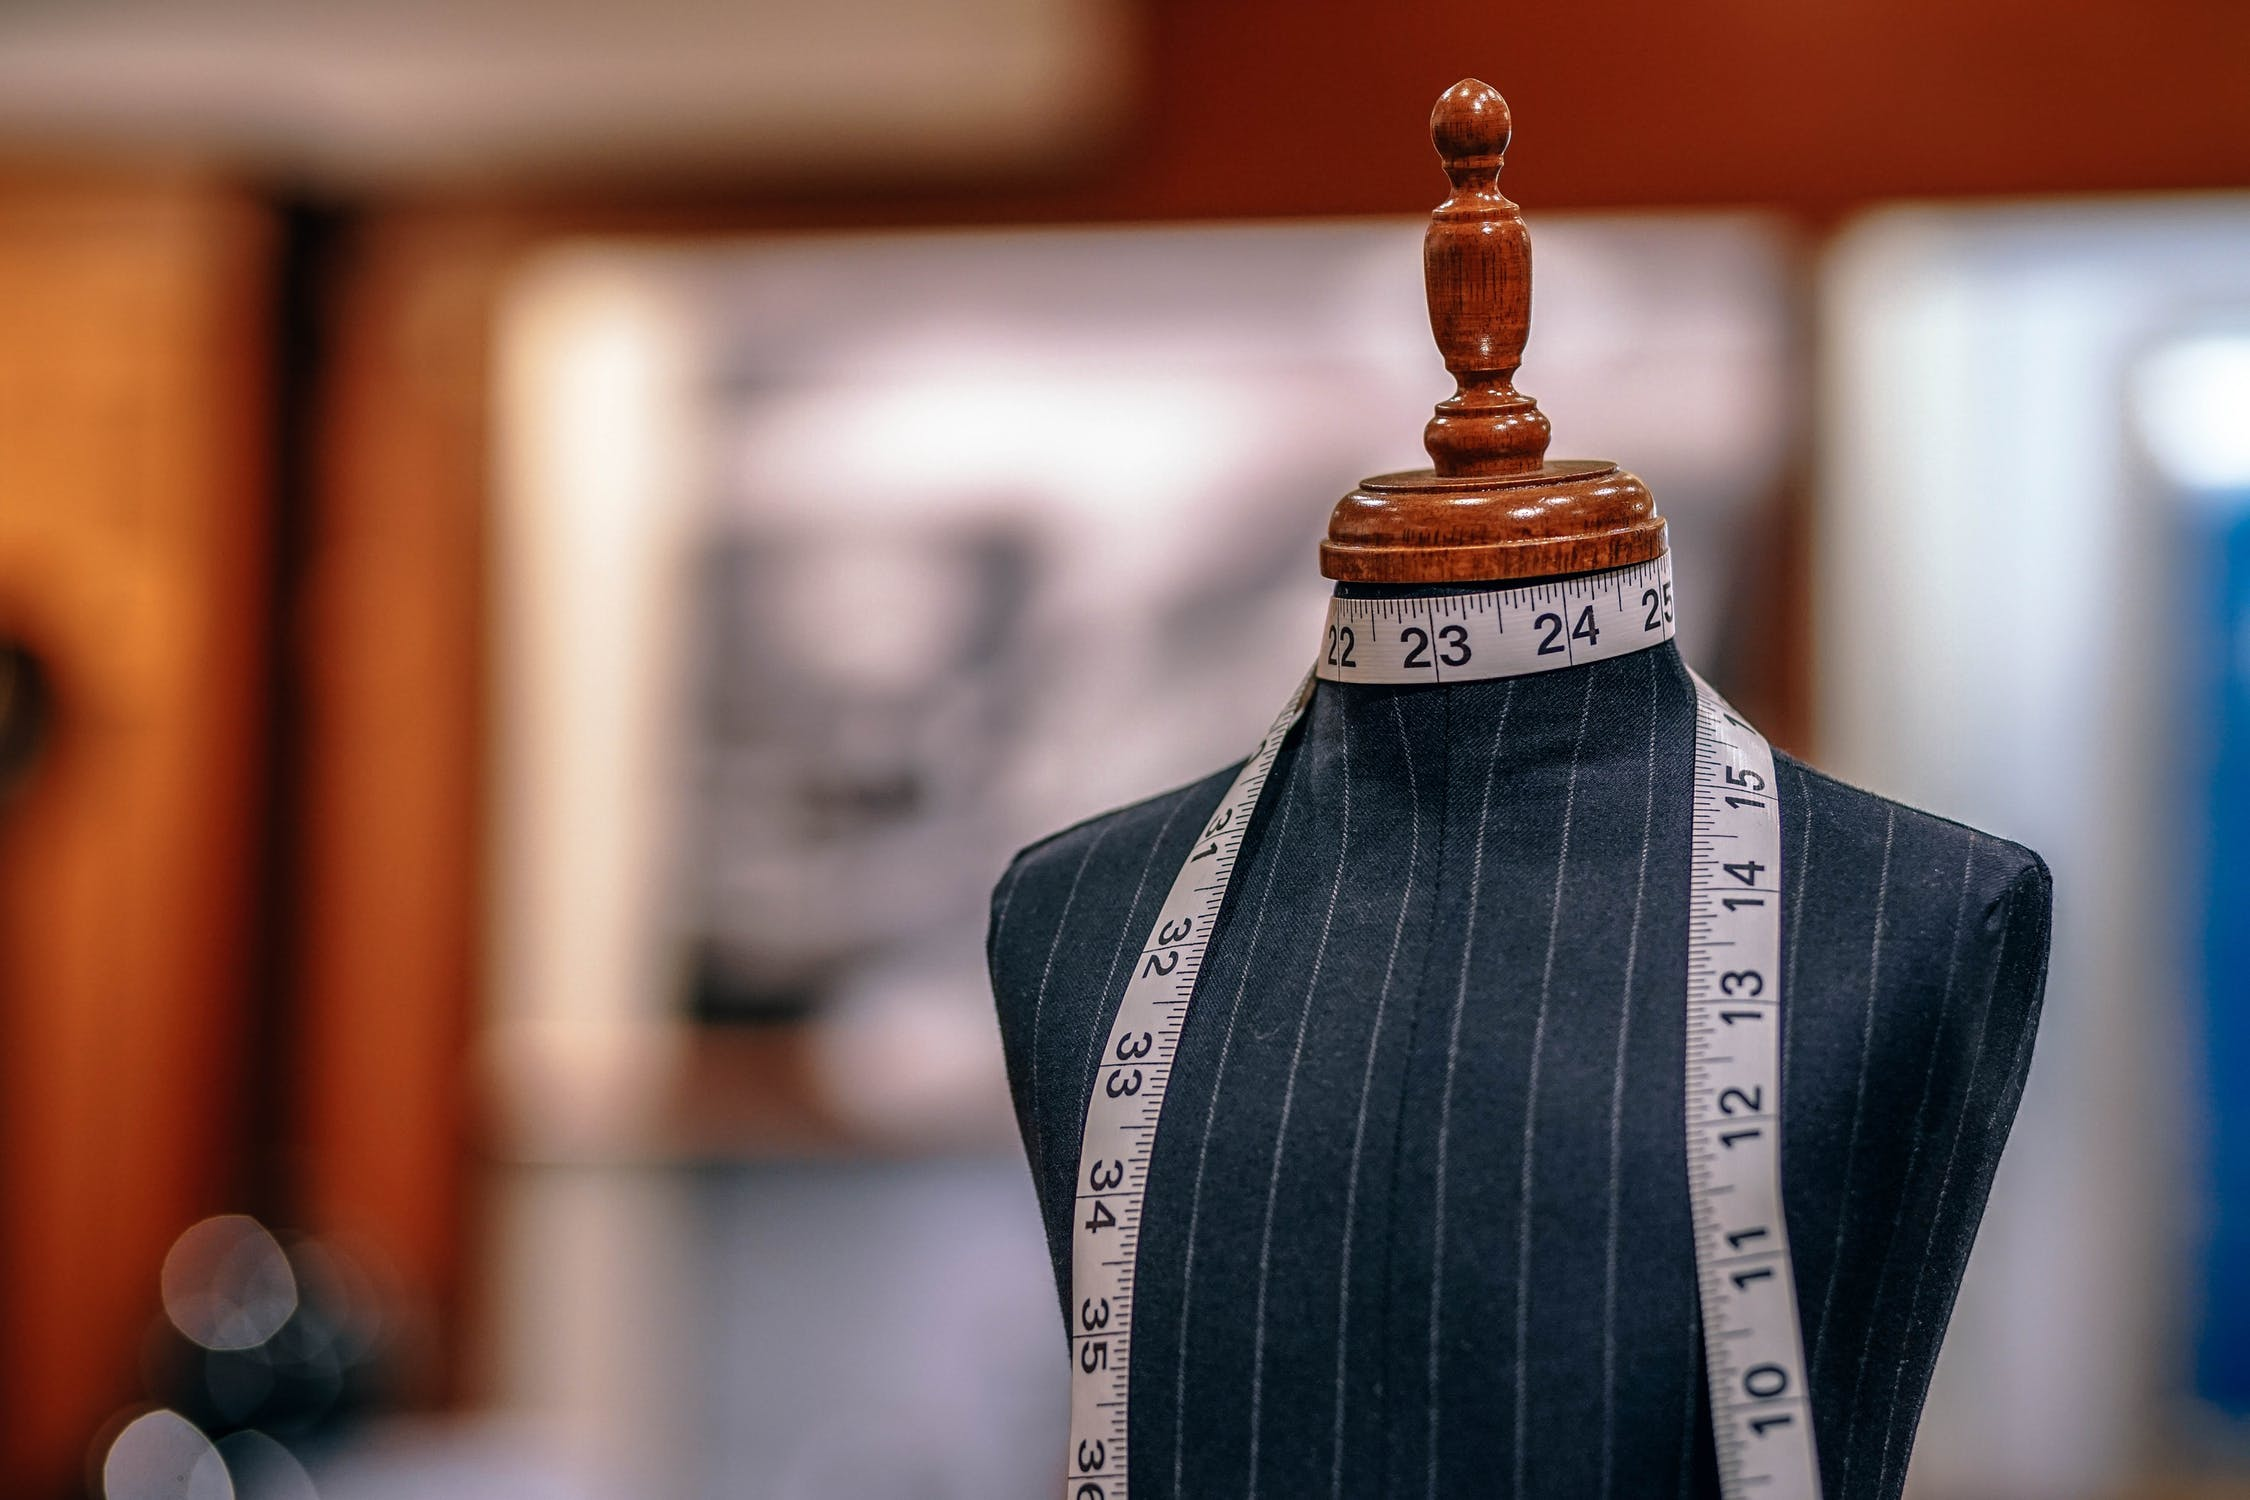 5 Career Options For Fashion Design Degree Holders No Sleep New York